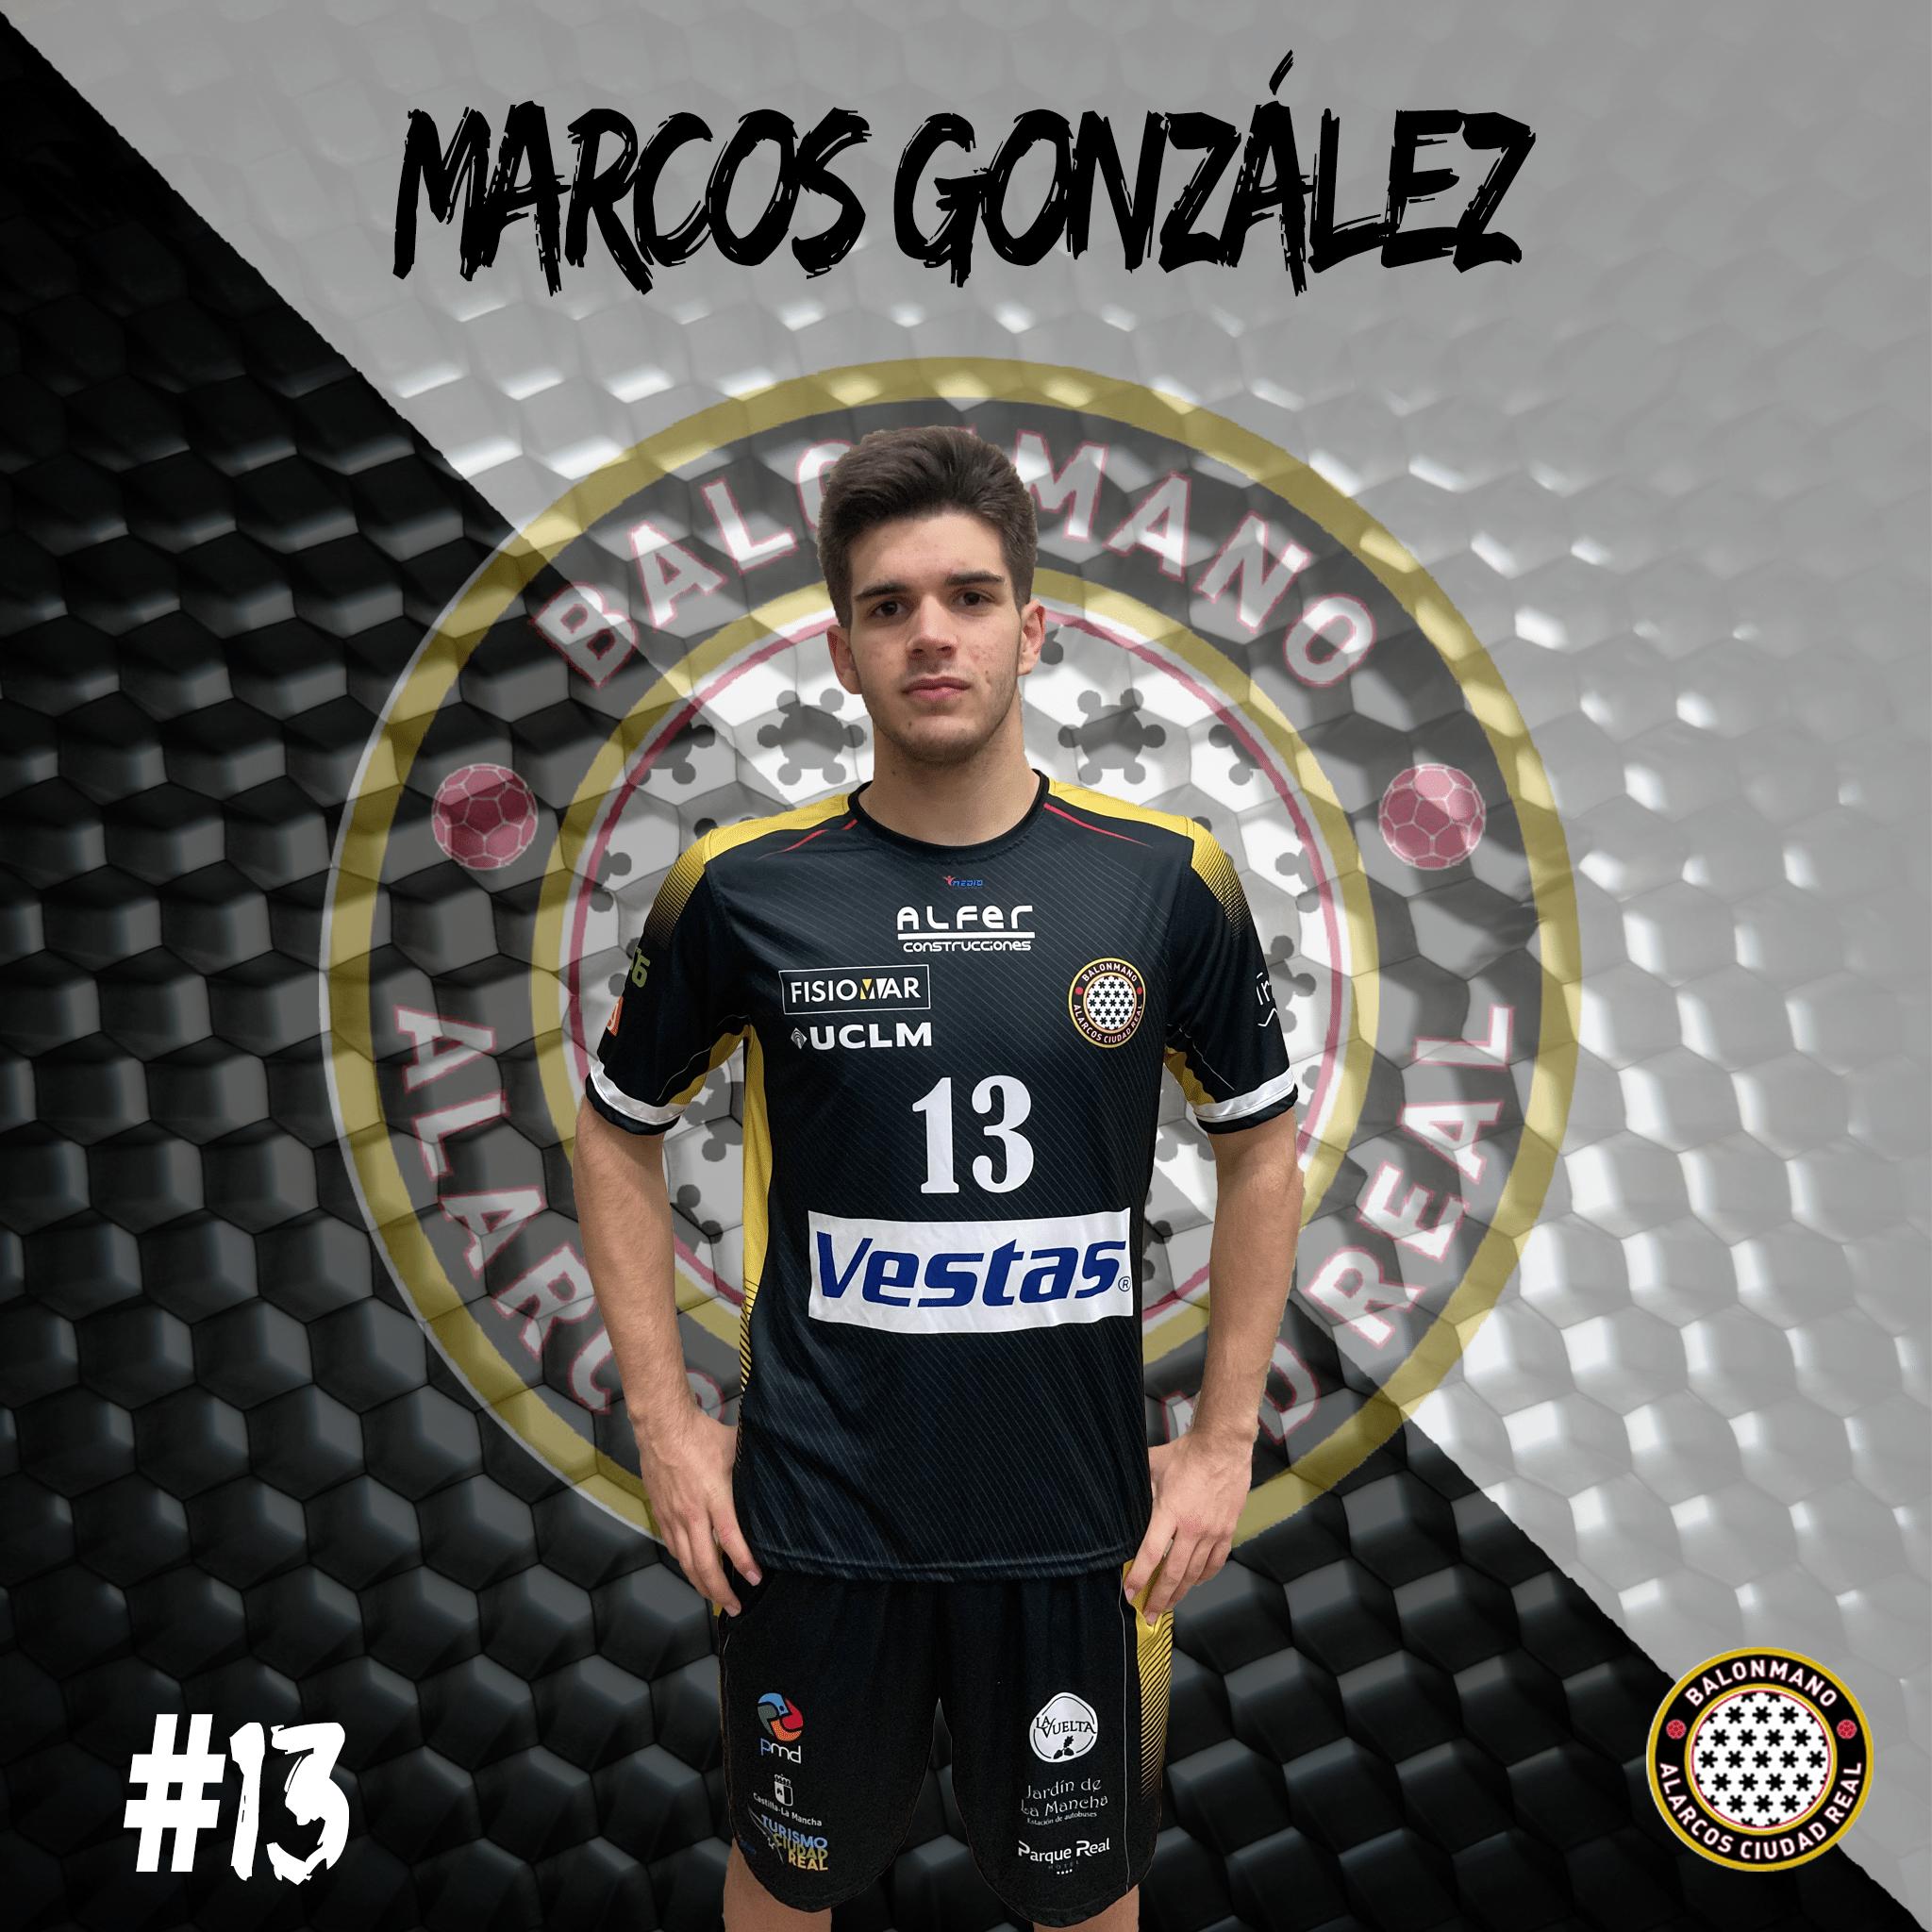 13. MARCOS GONZALEZ